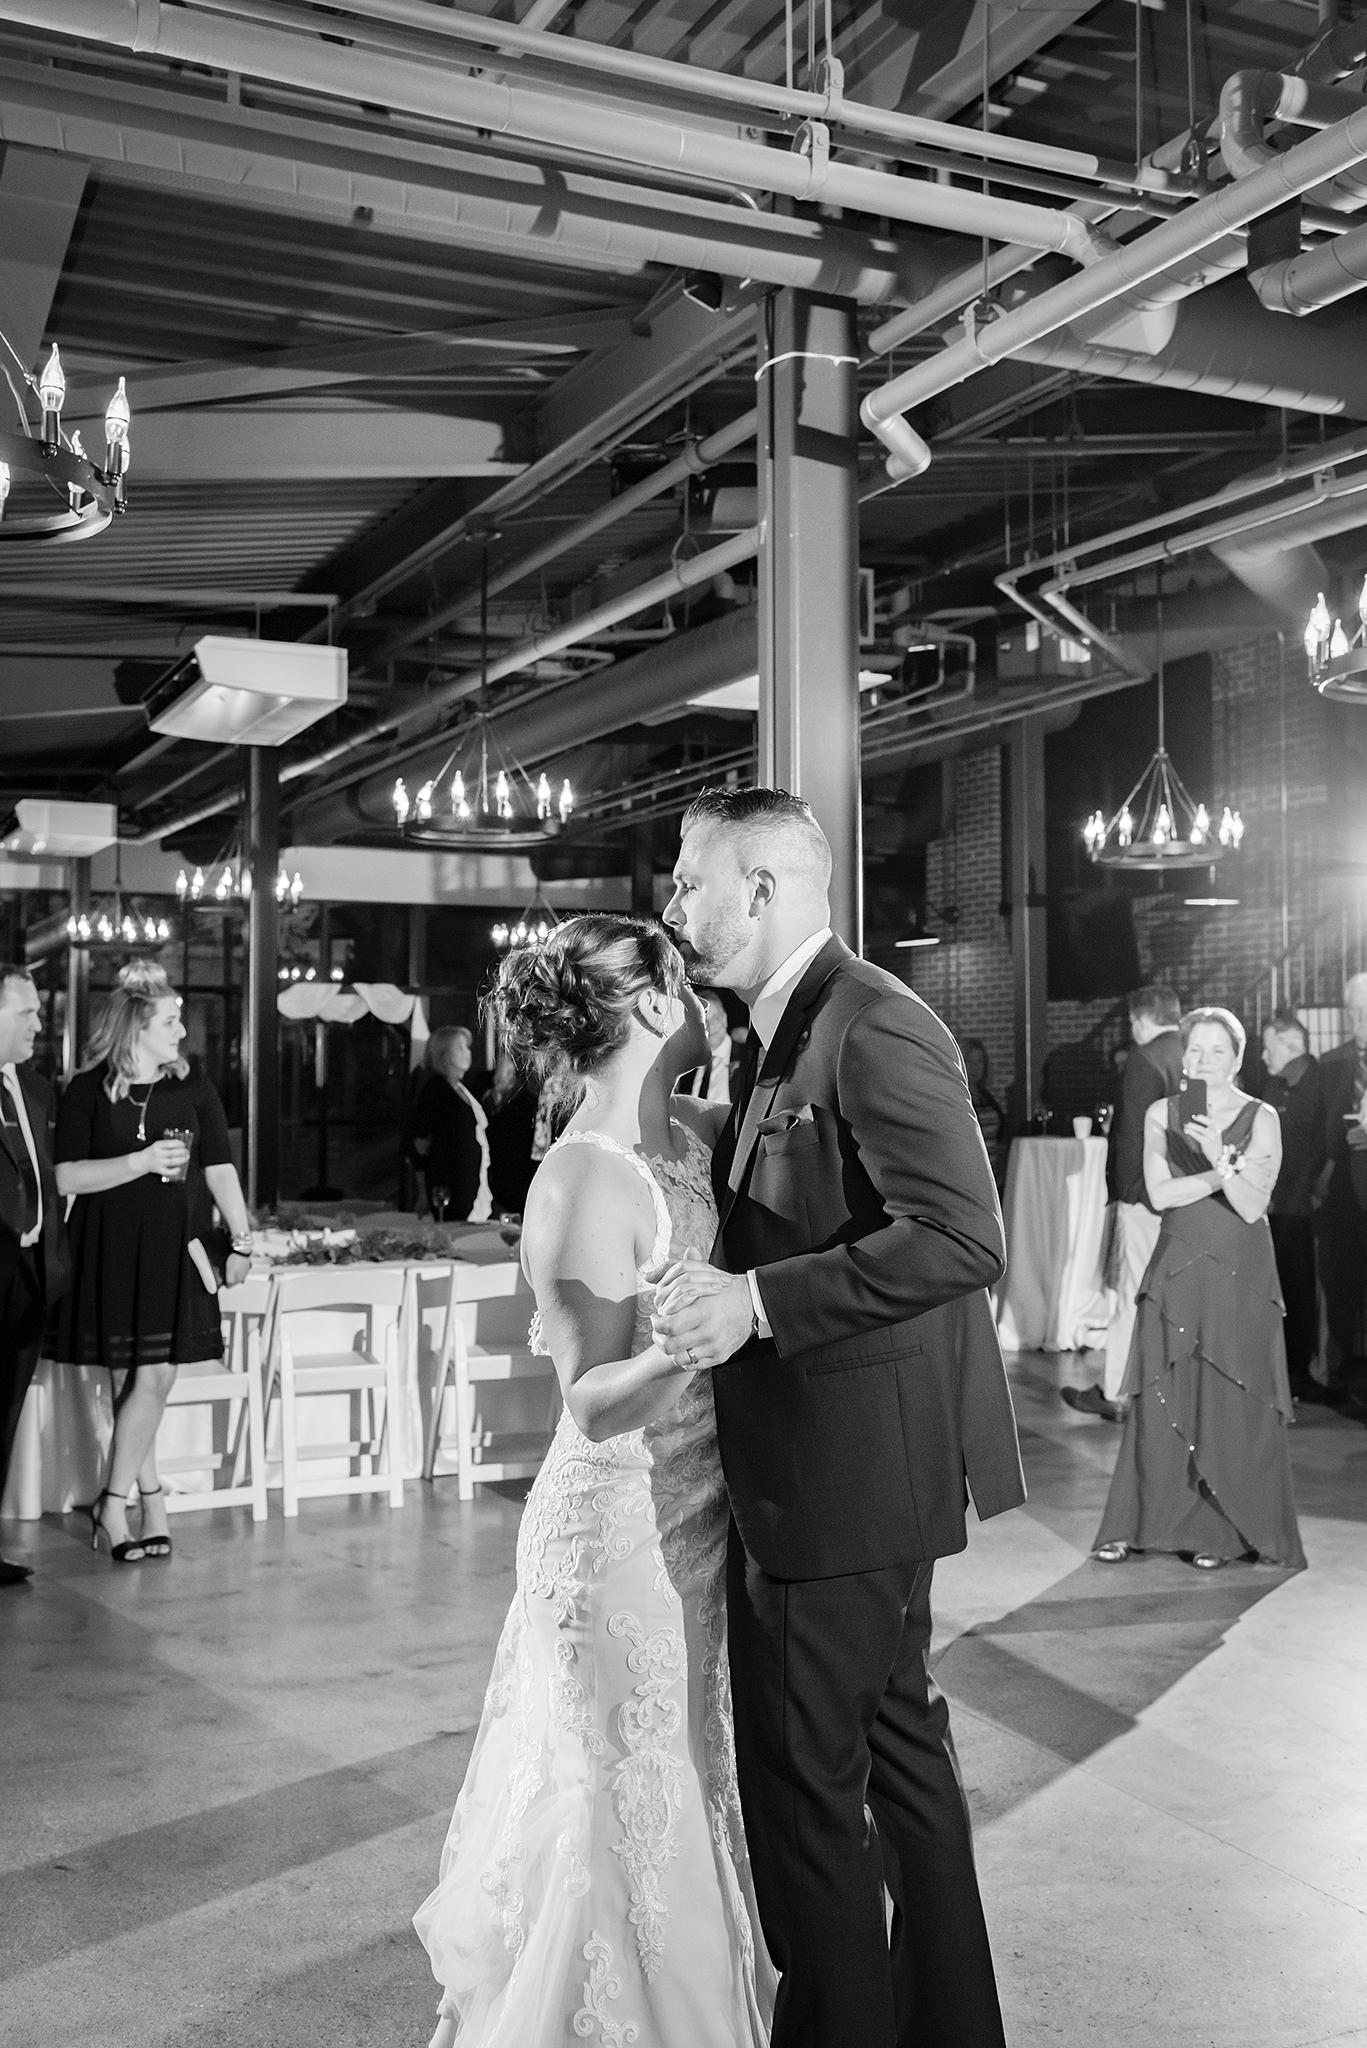 LINDSAY-ADKINS-PHOTOGRAPHY-MICHIGAN-WEDDING-PHOTOGRAPHER-FRANKENMUTH-BREWERY-WEDDING-MICHIGAN-BLOG-33